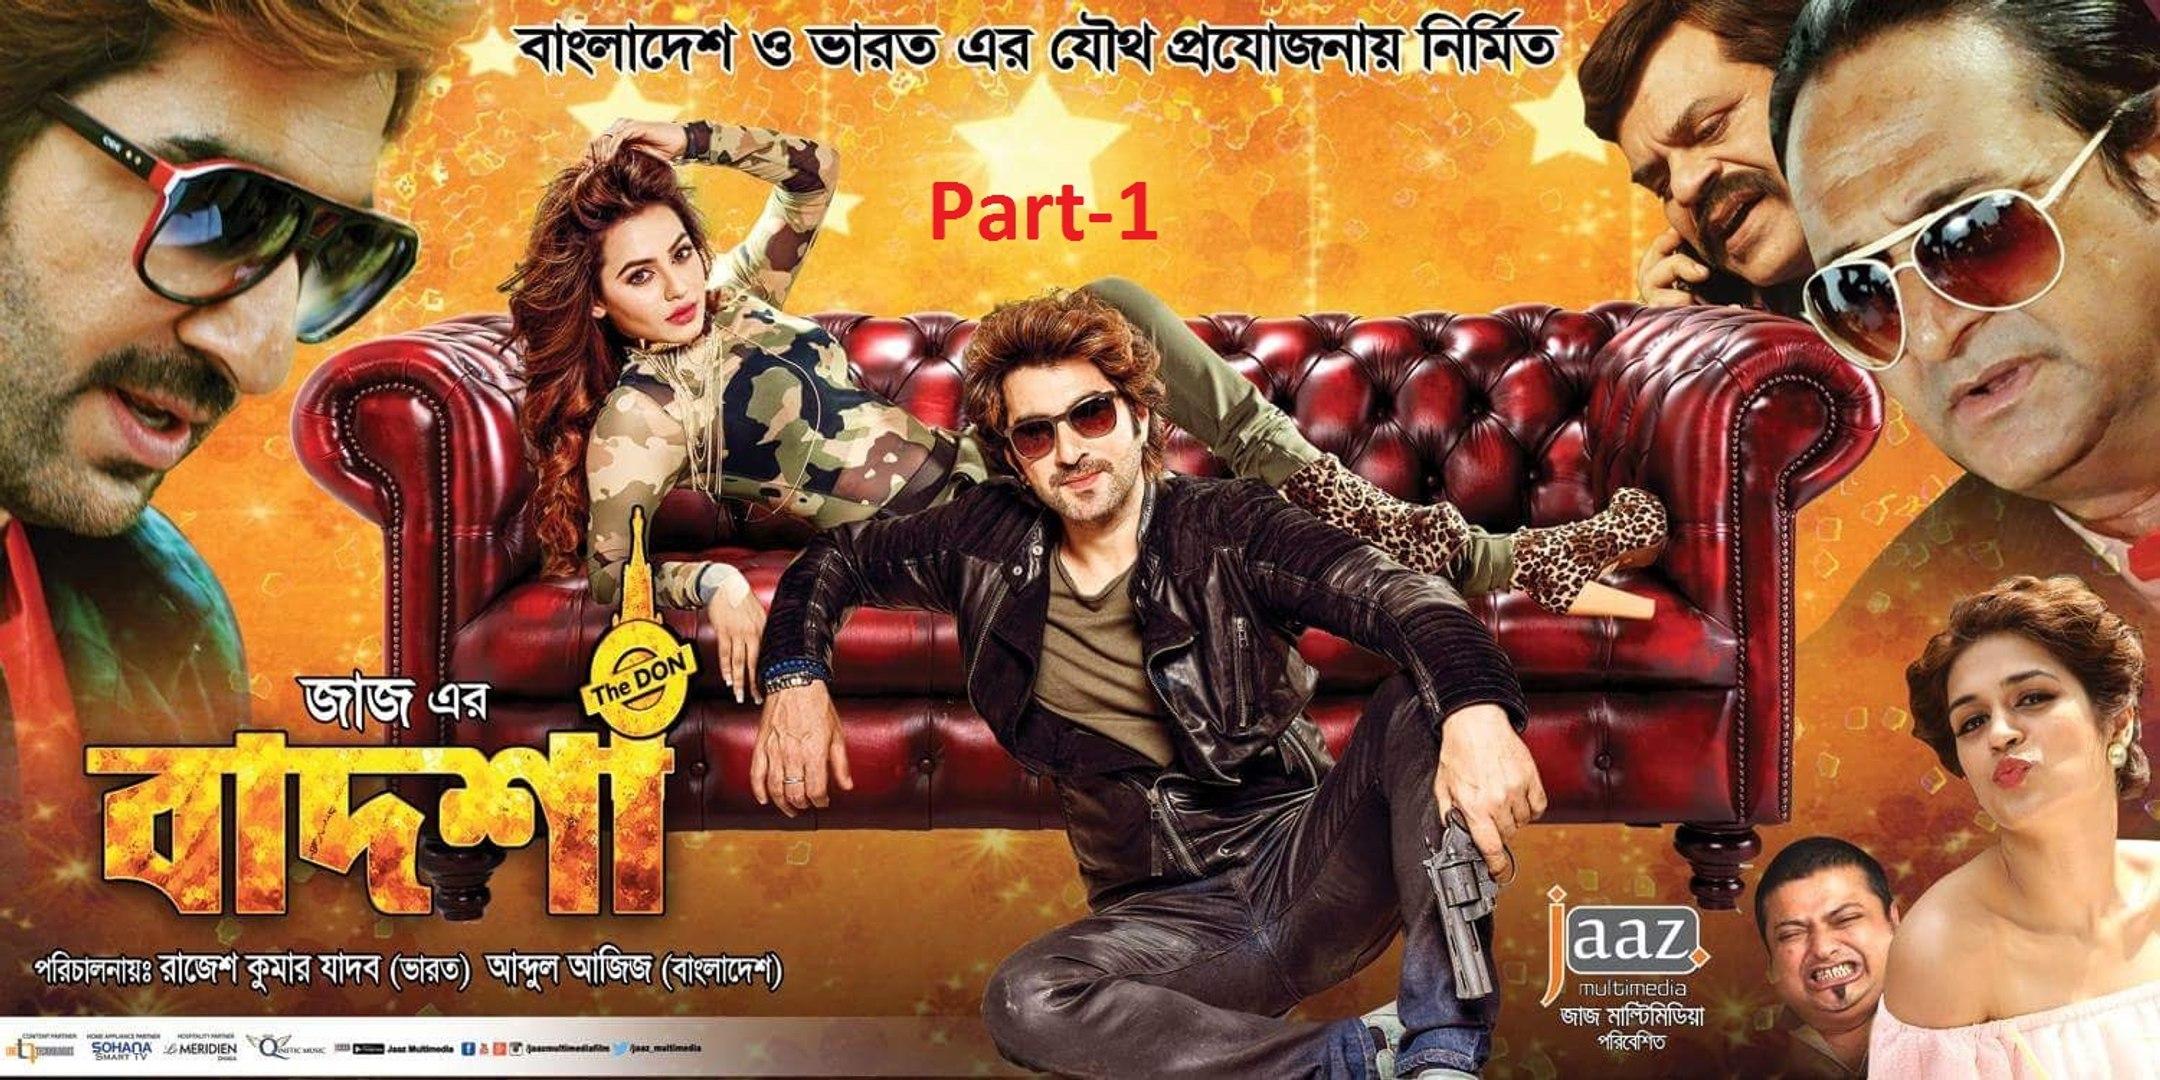 Badsha-The Don-বাদশা 2016। Part-1। New Bangla Kolkata movie 2016।।Jeet &  Nusrat Faria - video dailymotion